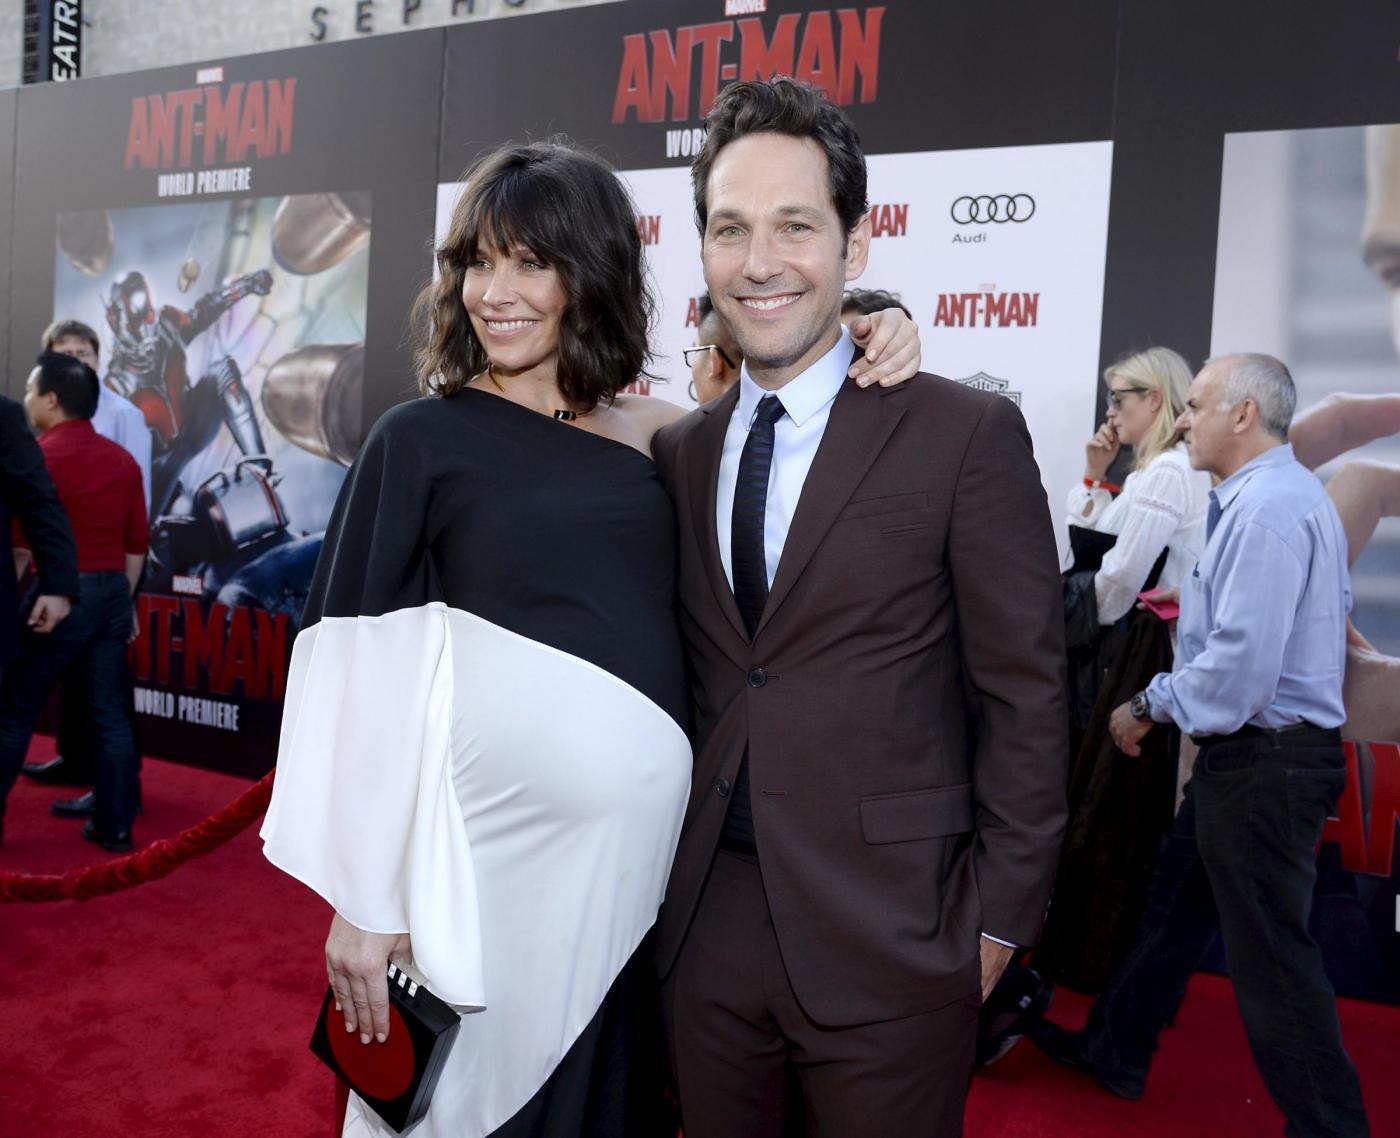 Ant-Man premiere mondiale